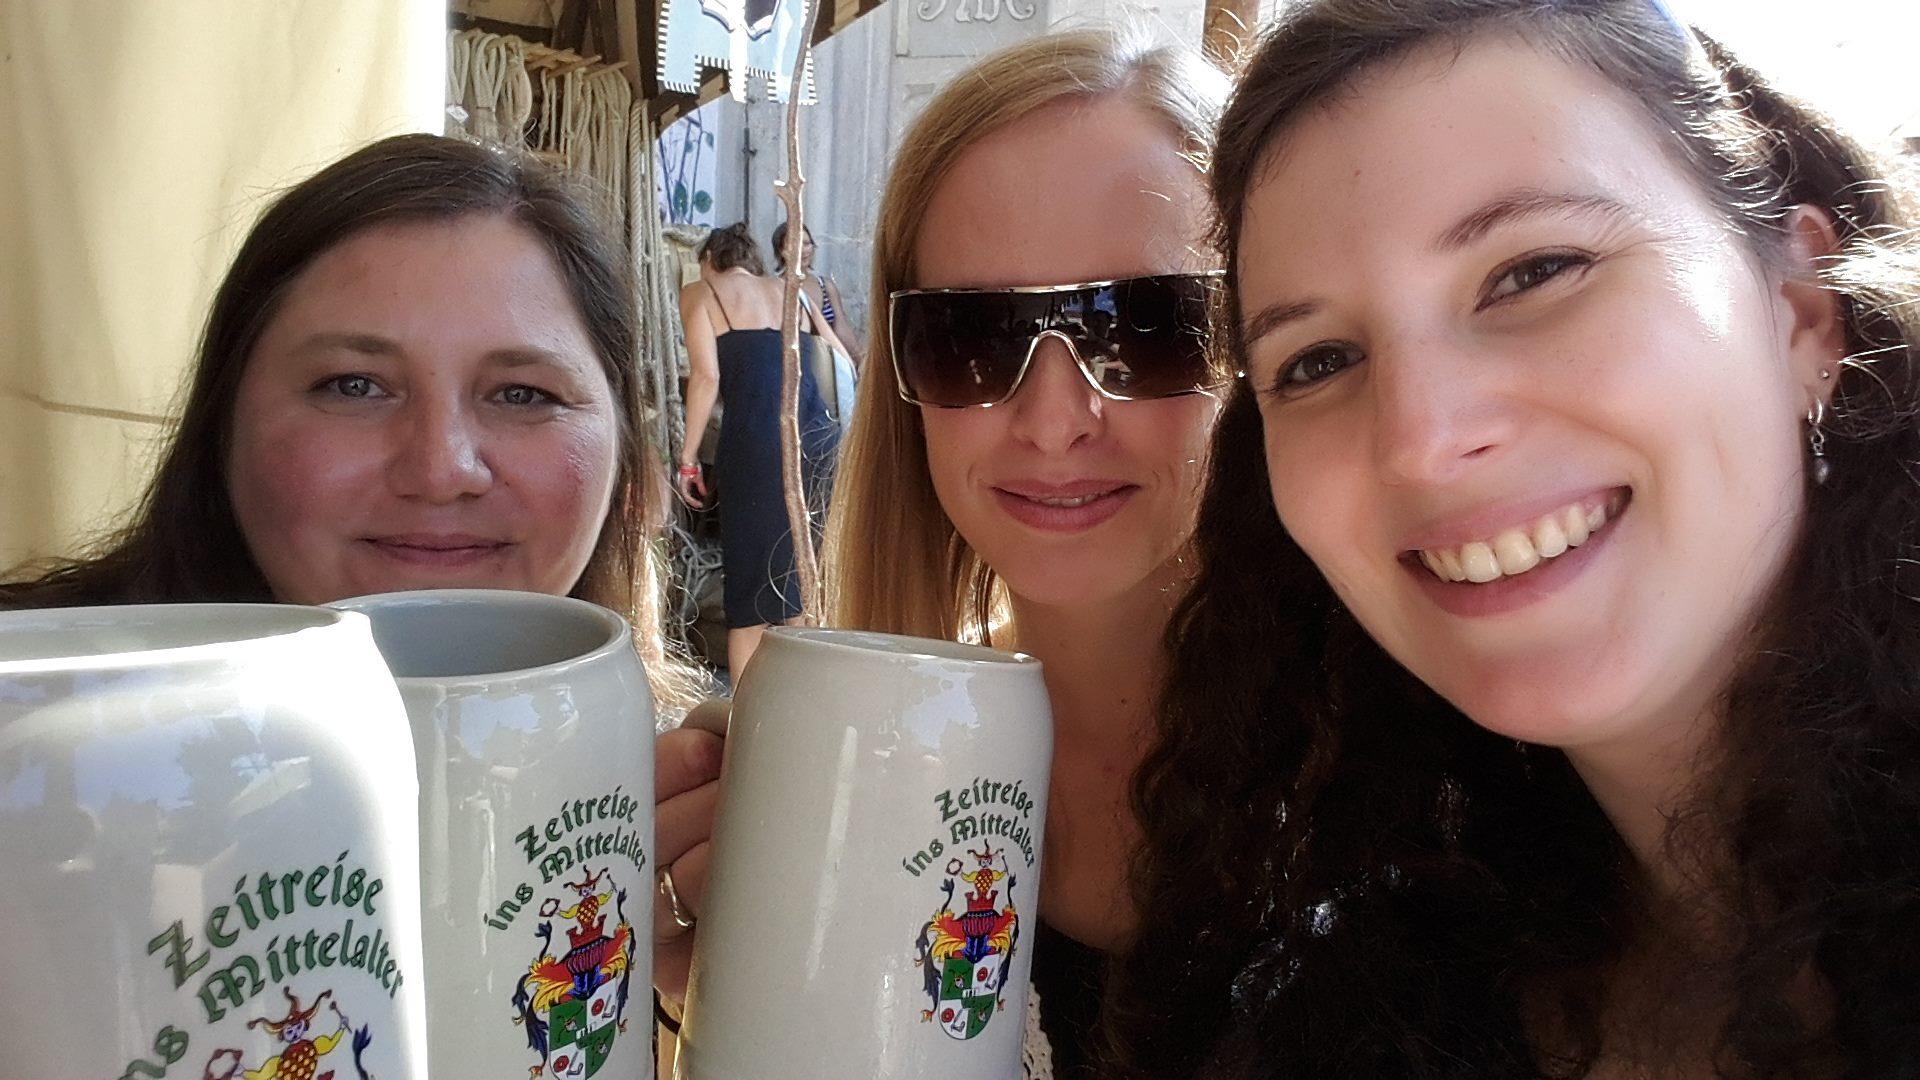 Bier danach